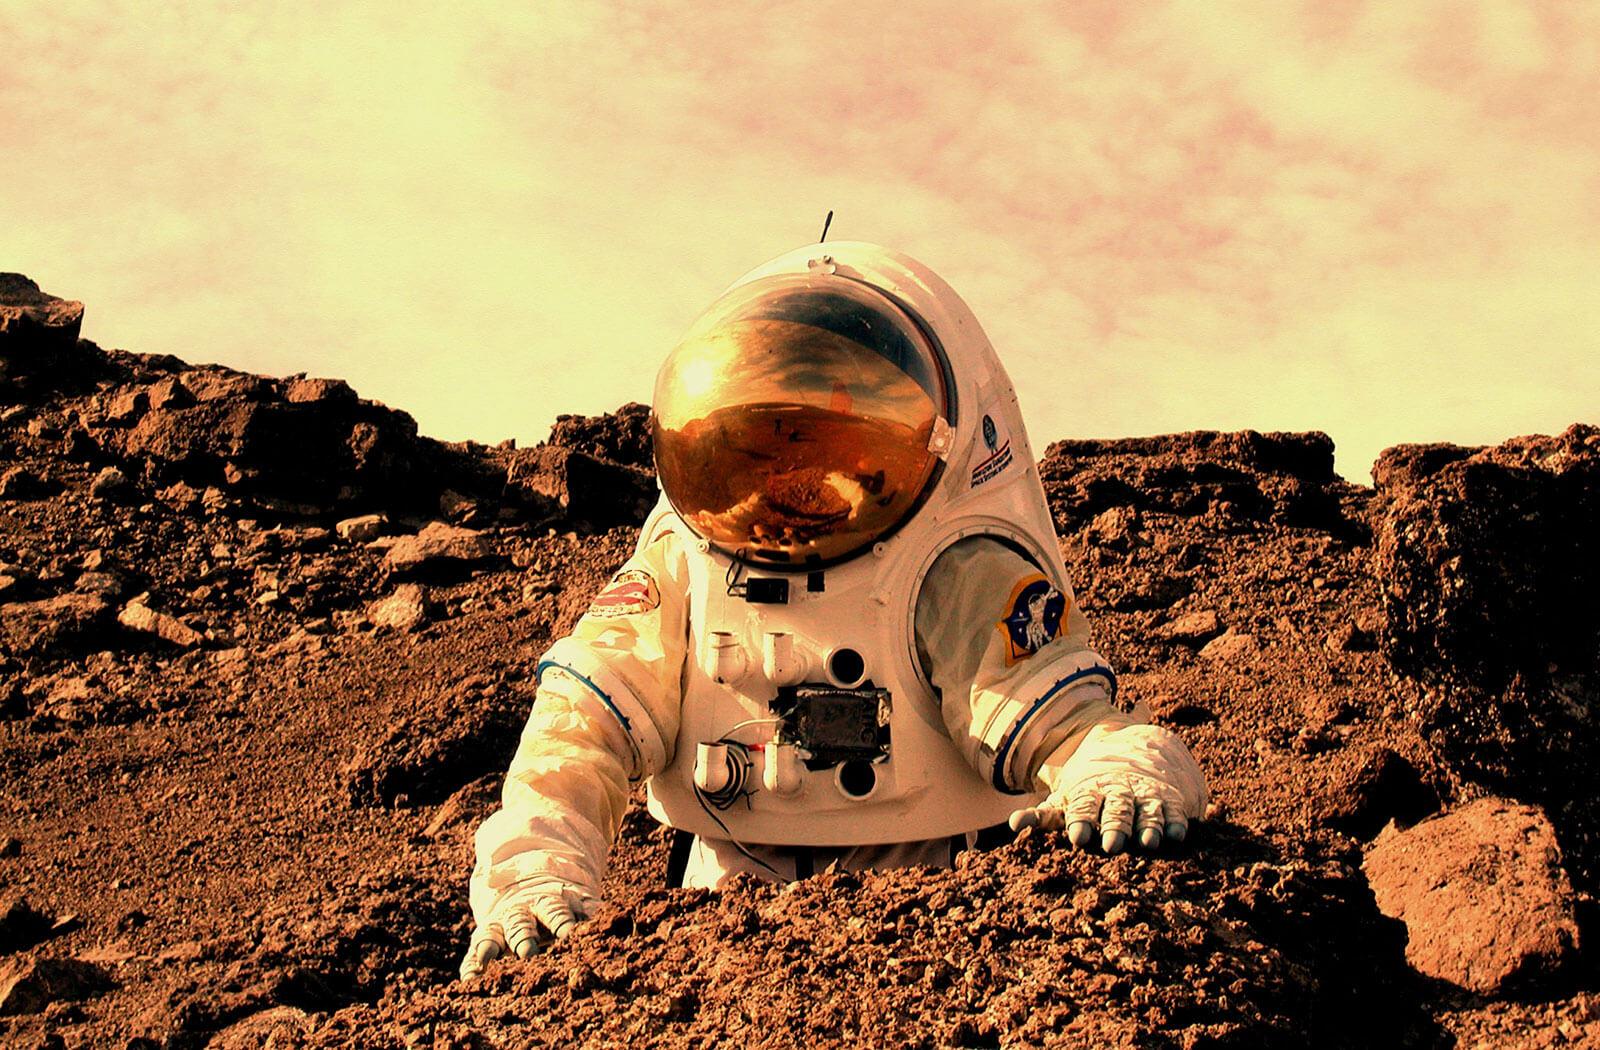 Astronaut working on Mars